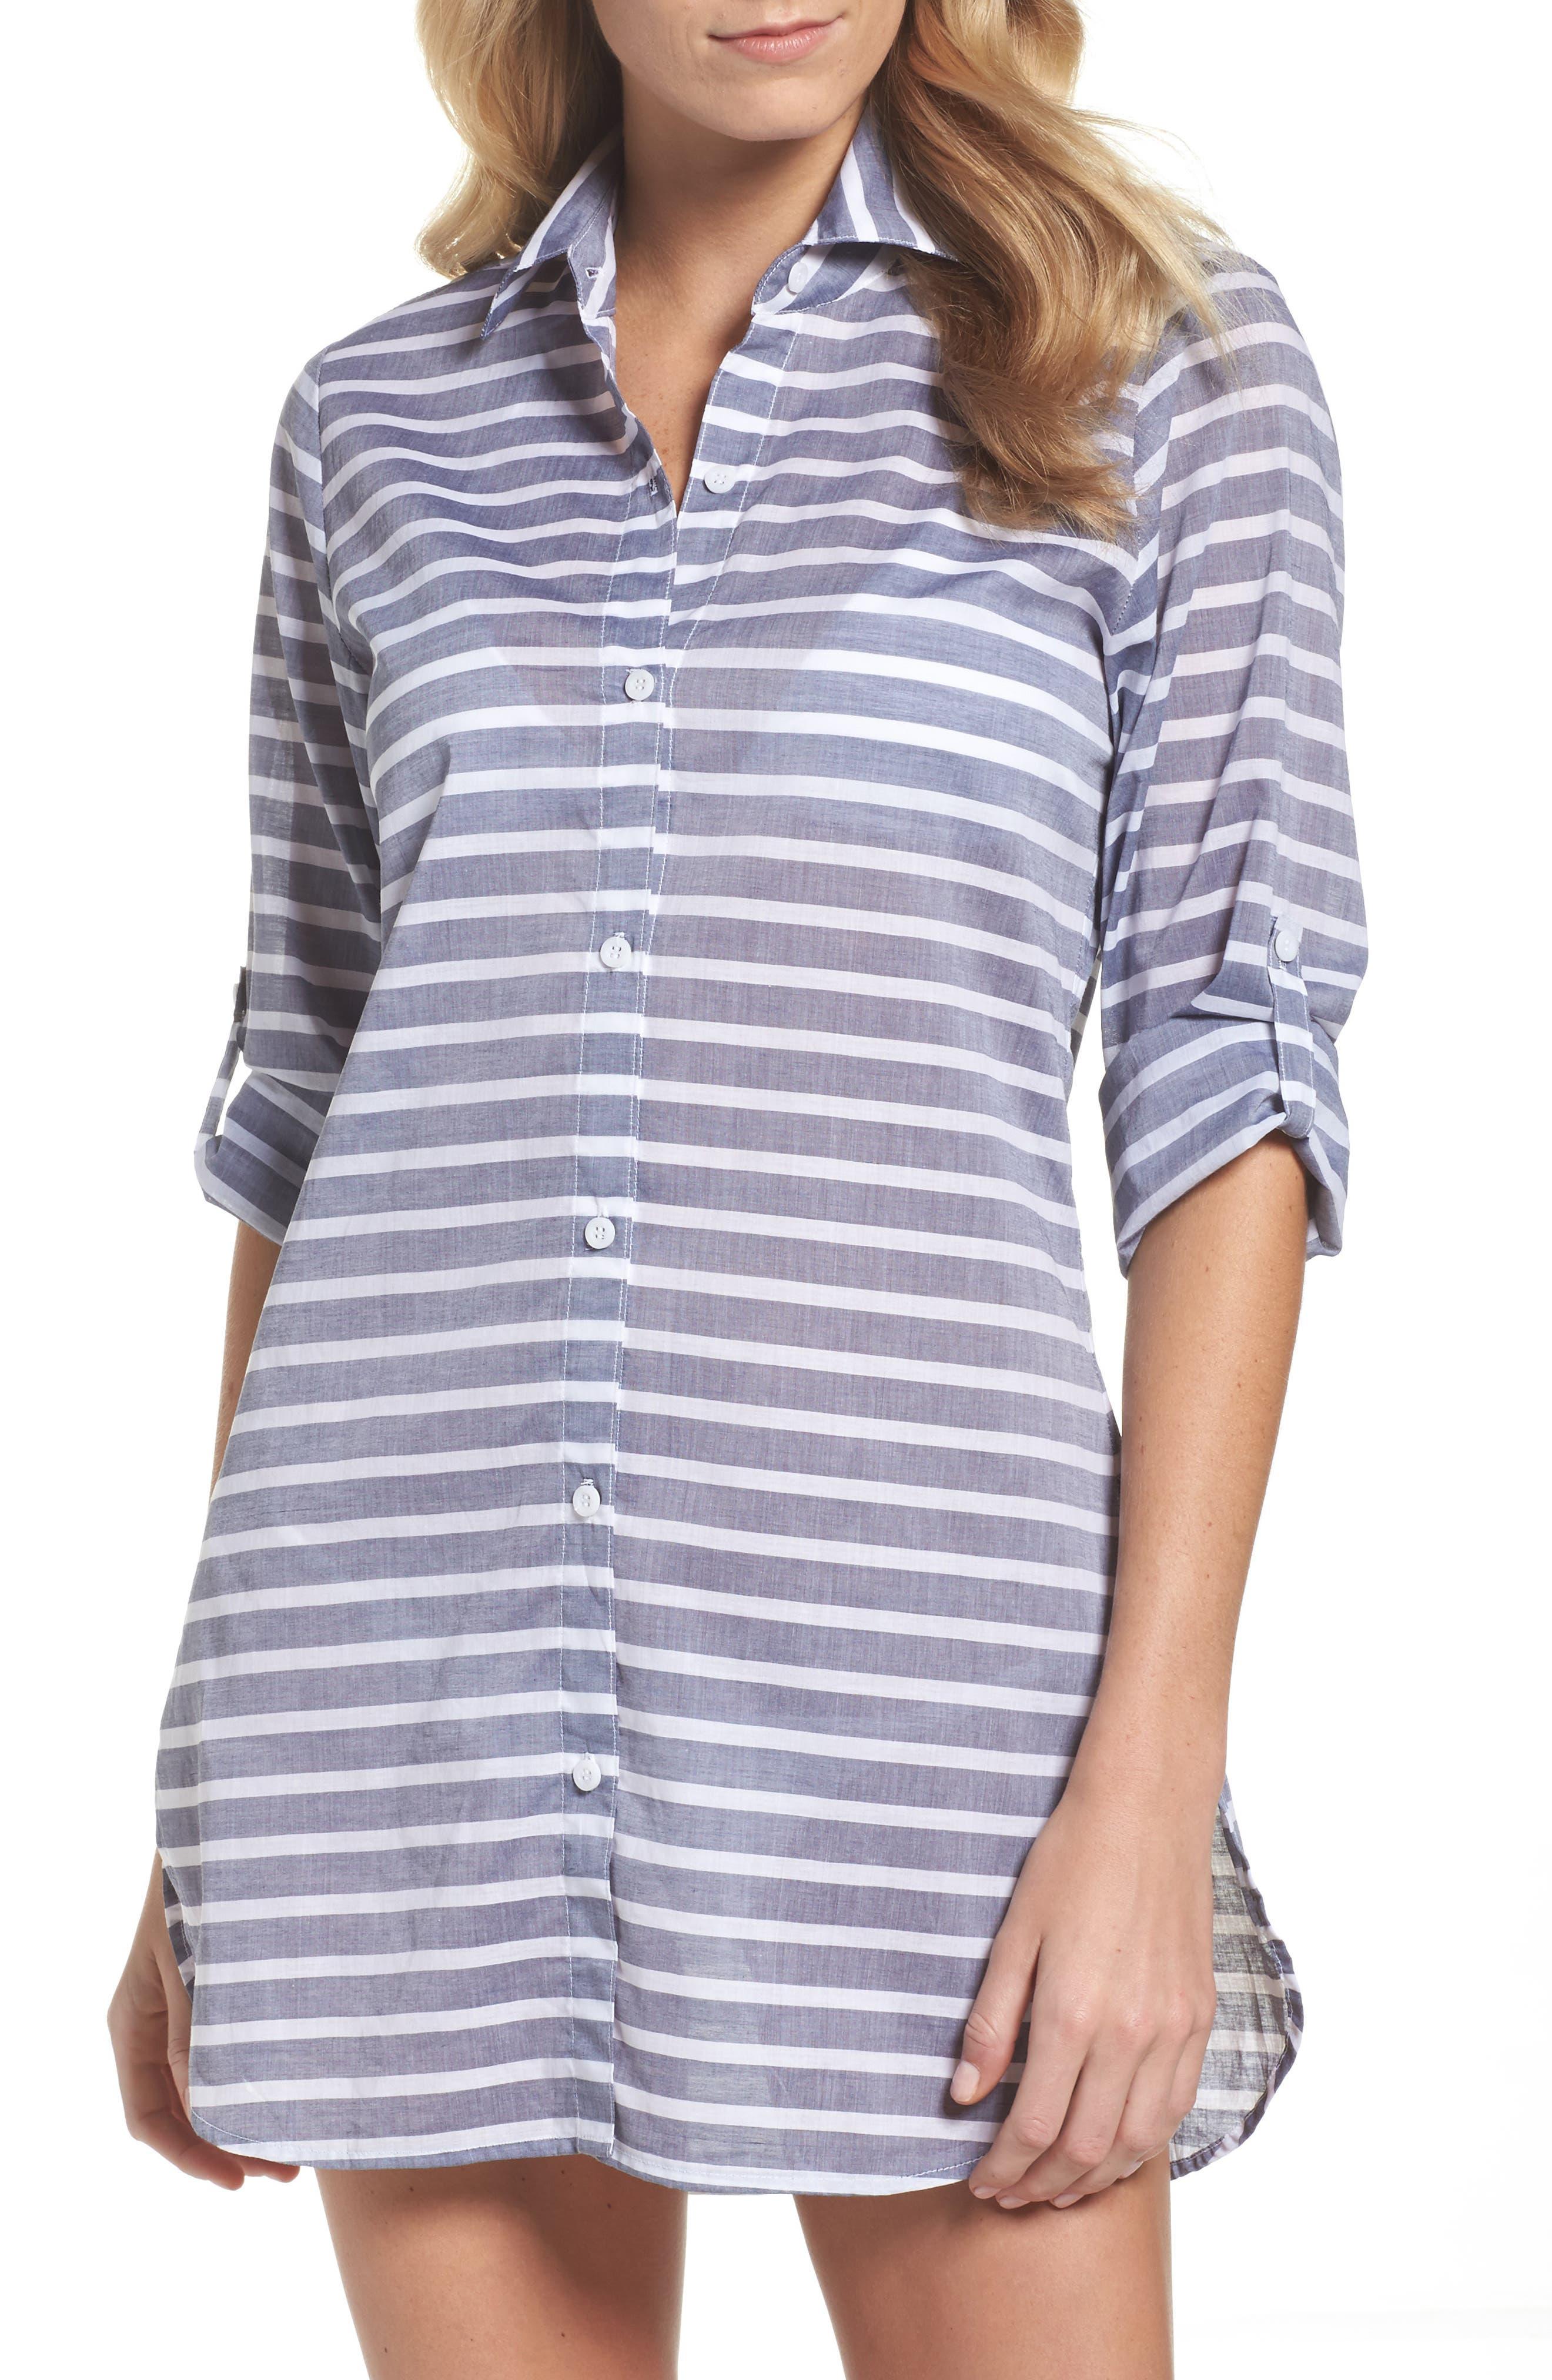 Main Image - Tommy Bahama Brenton Stripe Boyfriend Shirt Cover-Up